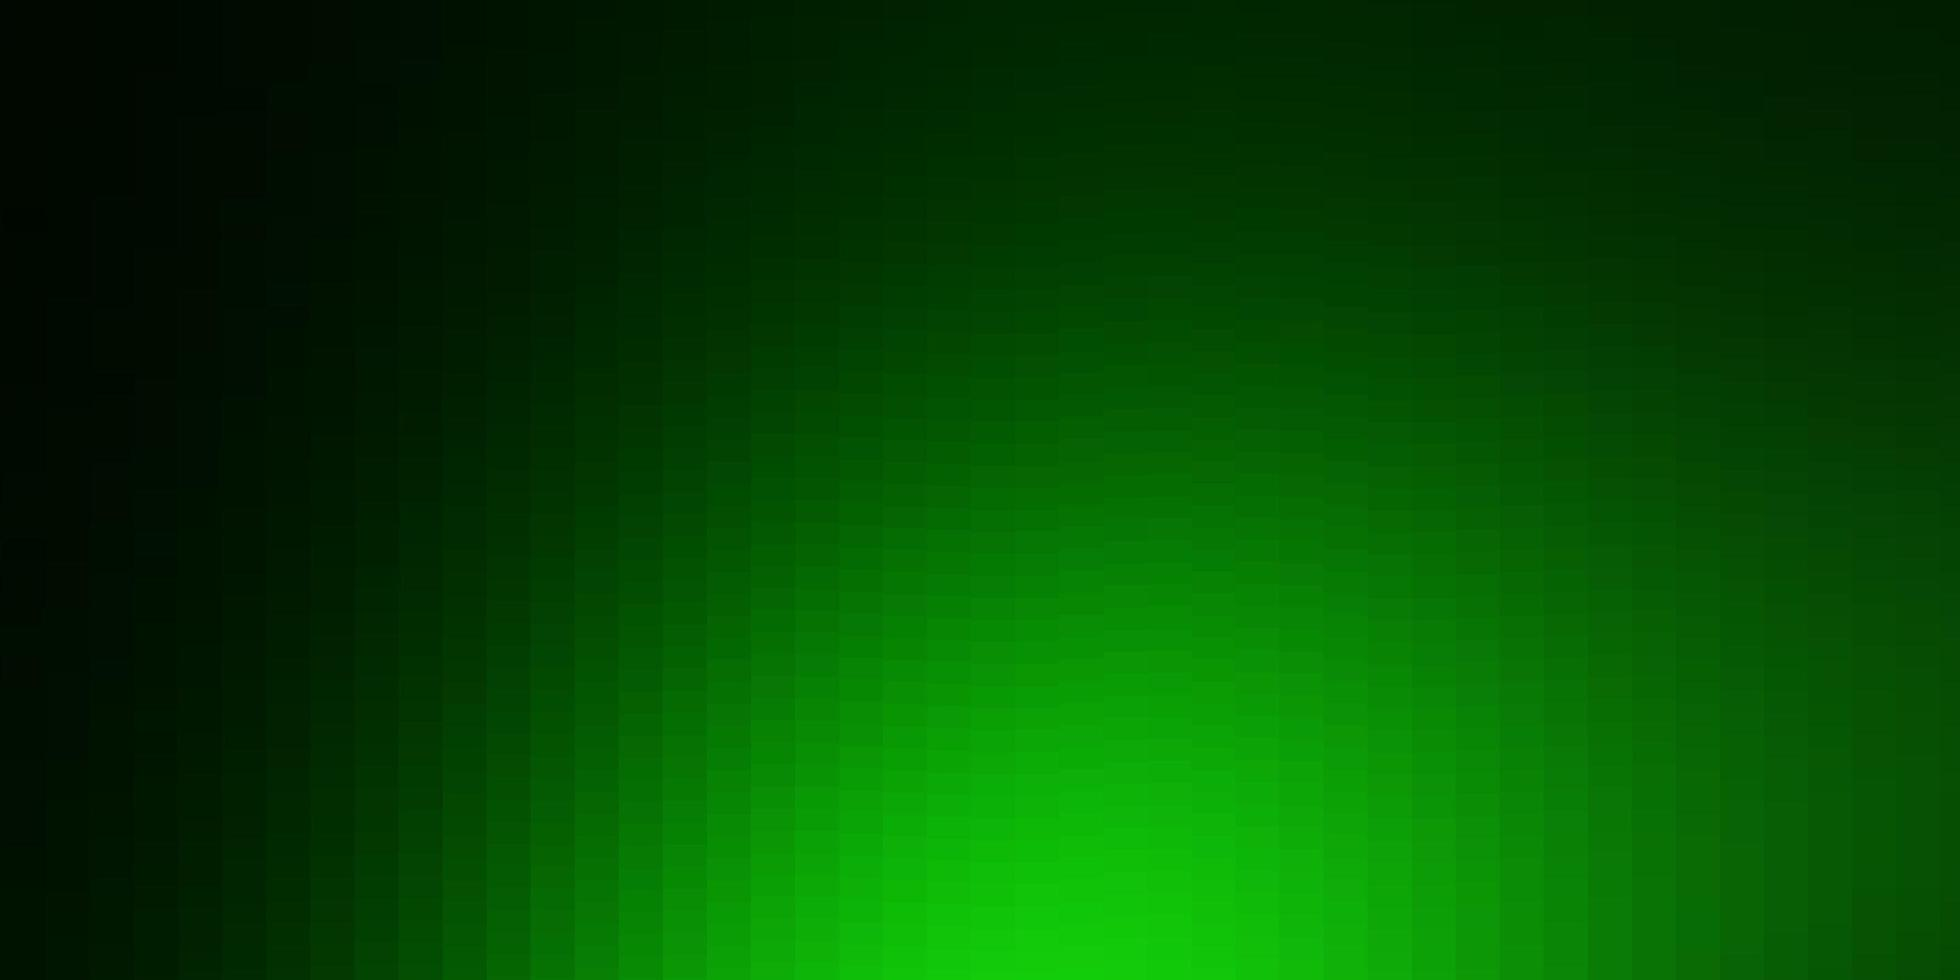 fondo verde claro en estilo poligonal. vector